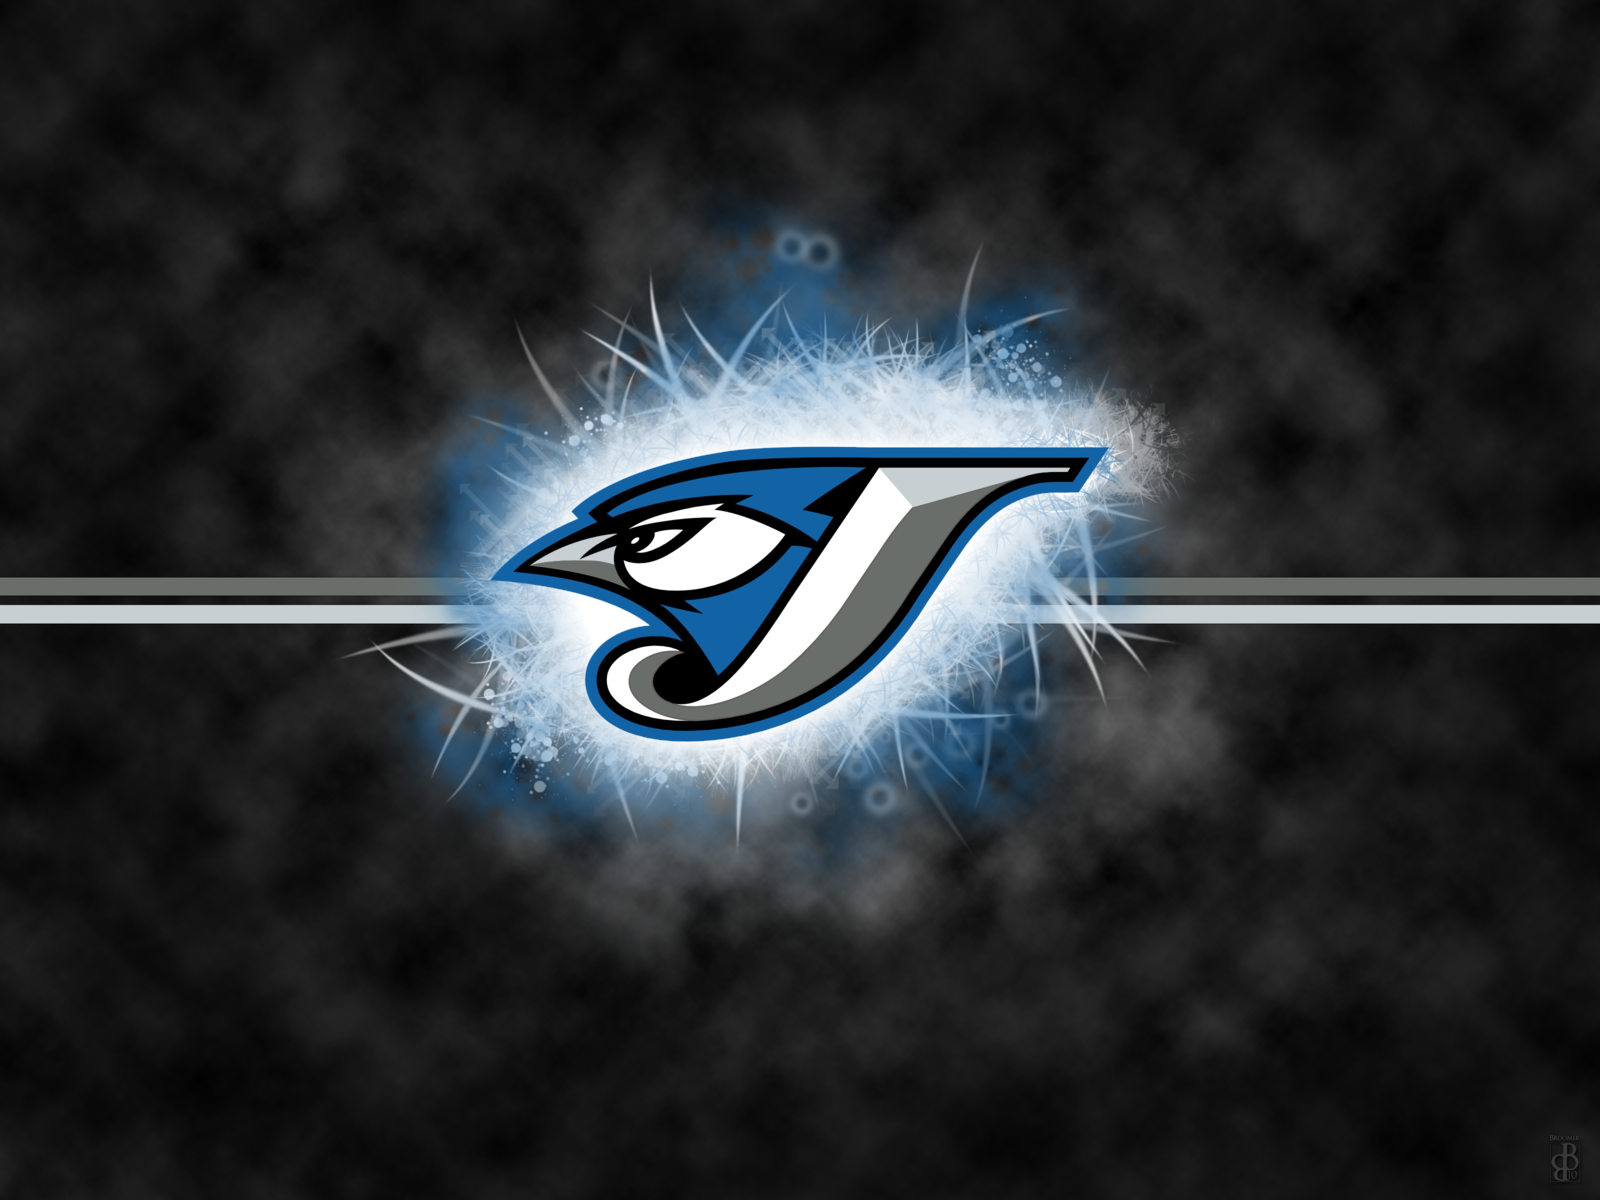 TORONTO BLUE JAYS mlb baseball 1 wallpaper 1600x1200 228015 1600x1200